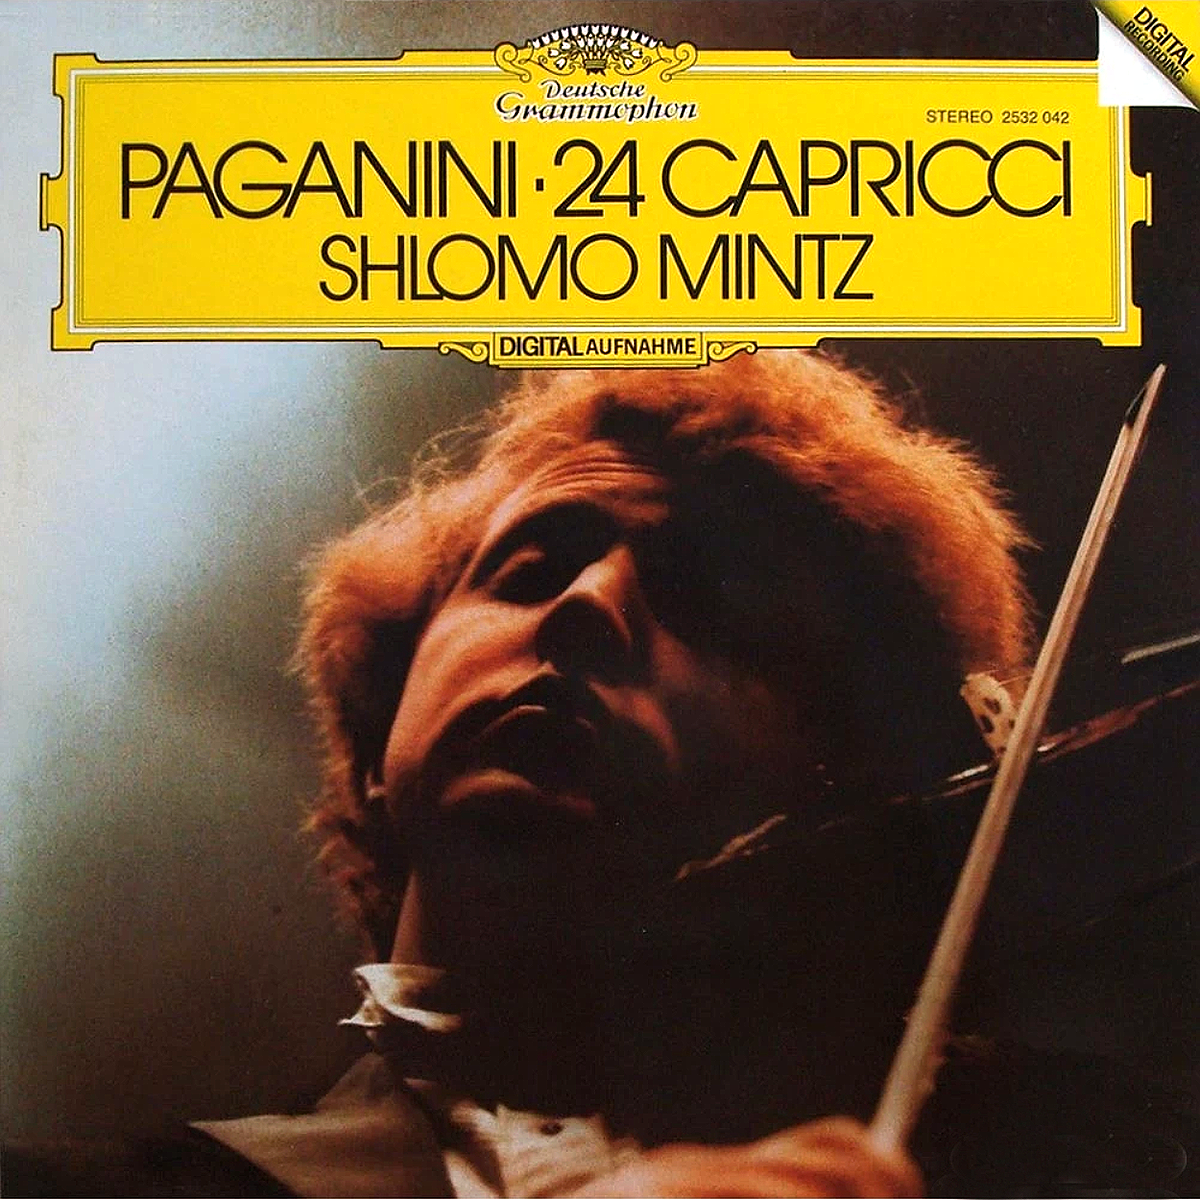 DGG 2532042 Paganini Caprices Mintz